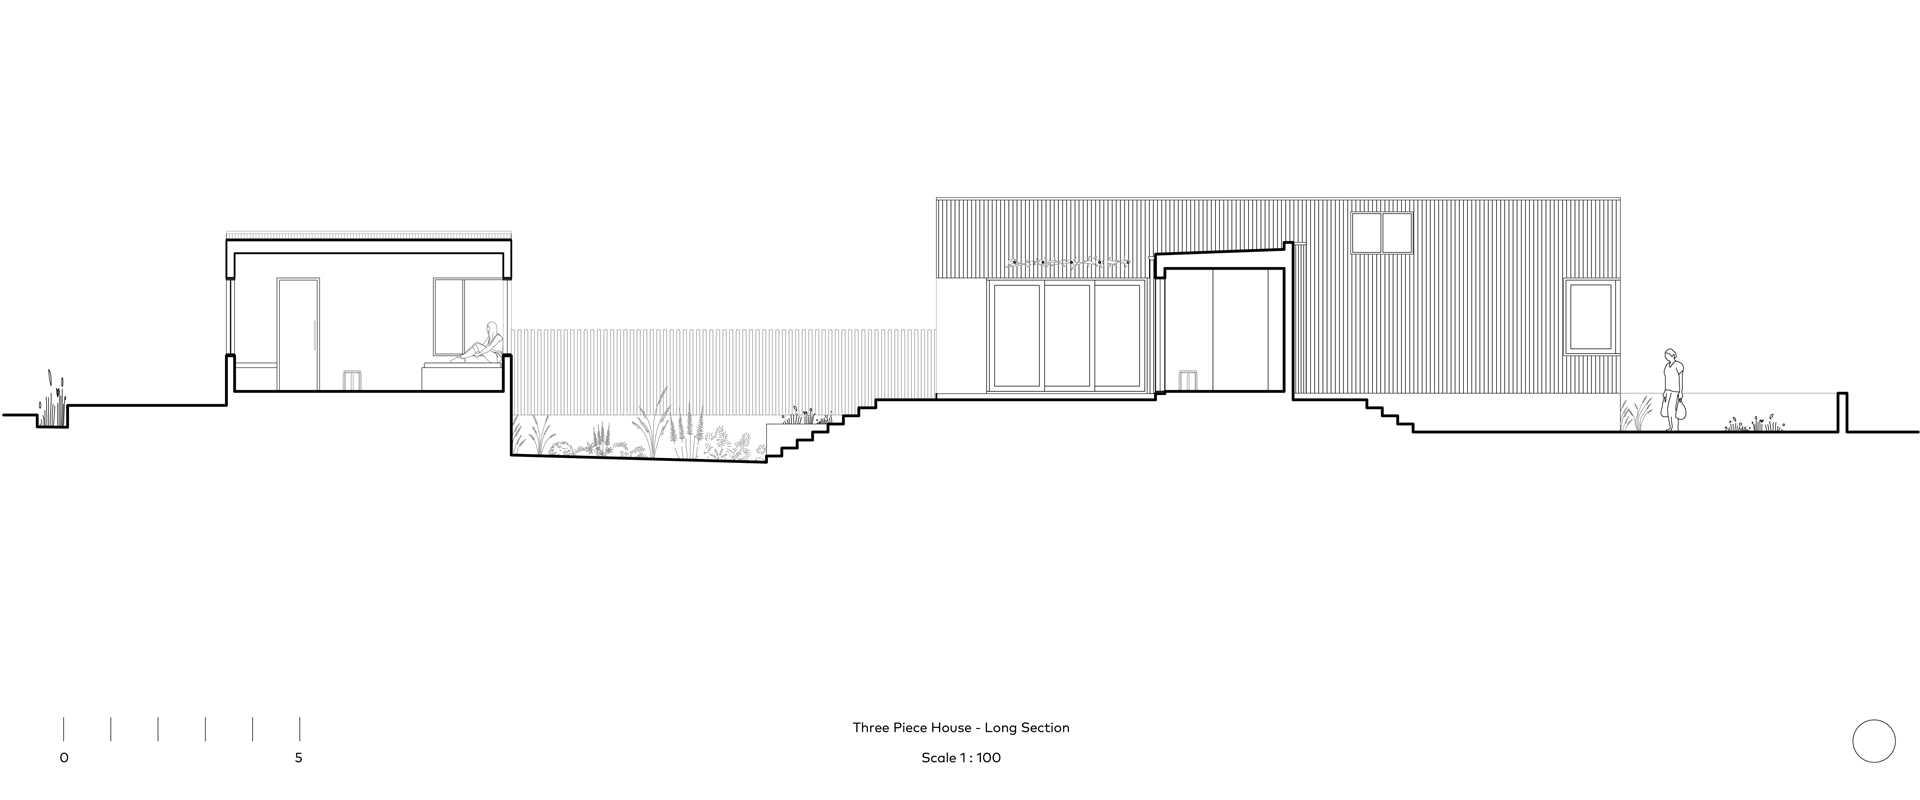 Three Piece House  - 36 11 53